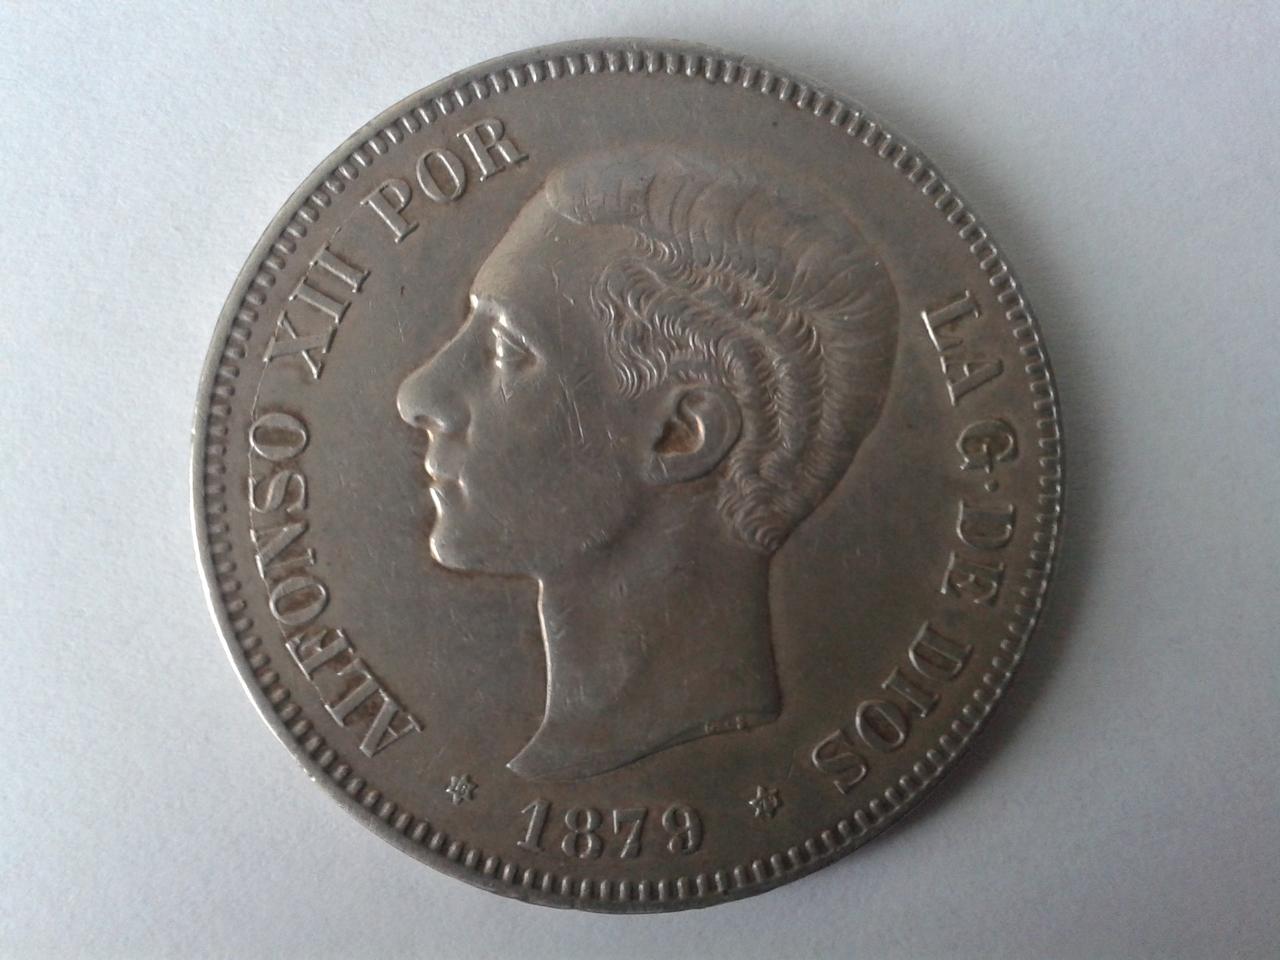 5 pesetas 1879 - Alfonso XII 20141019_161330